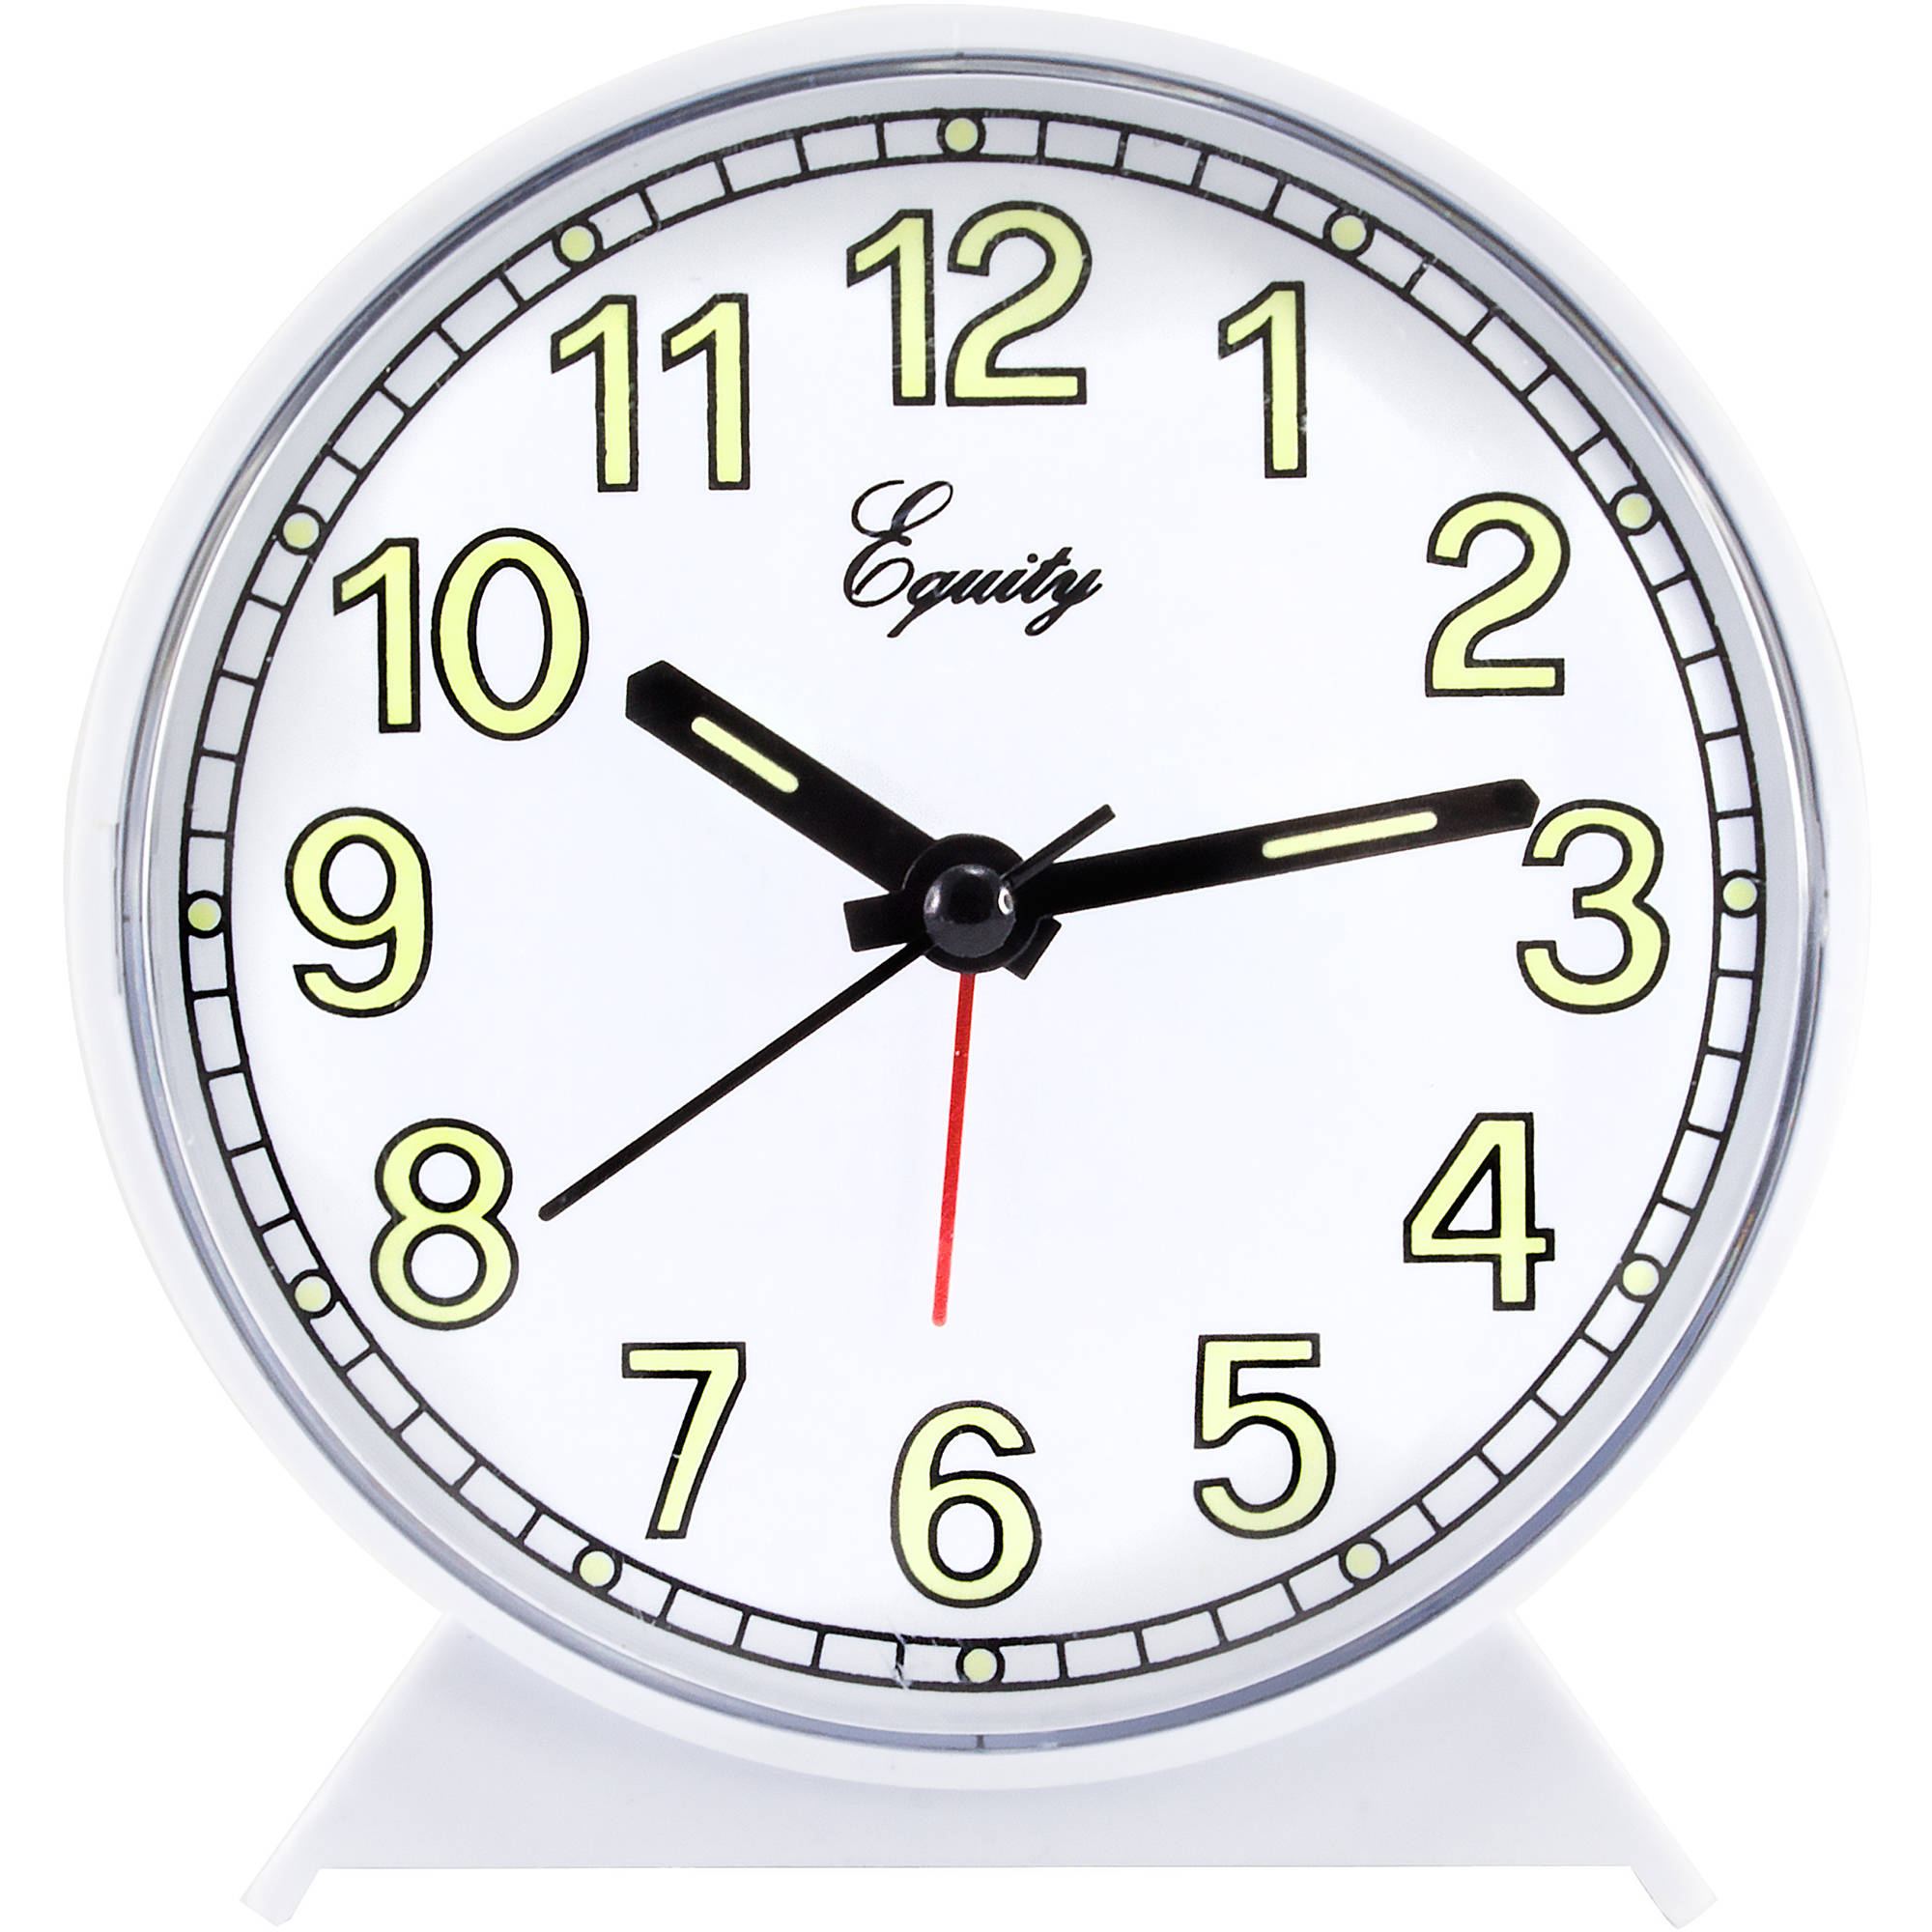 Projection Alarm Clocks